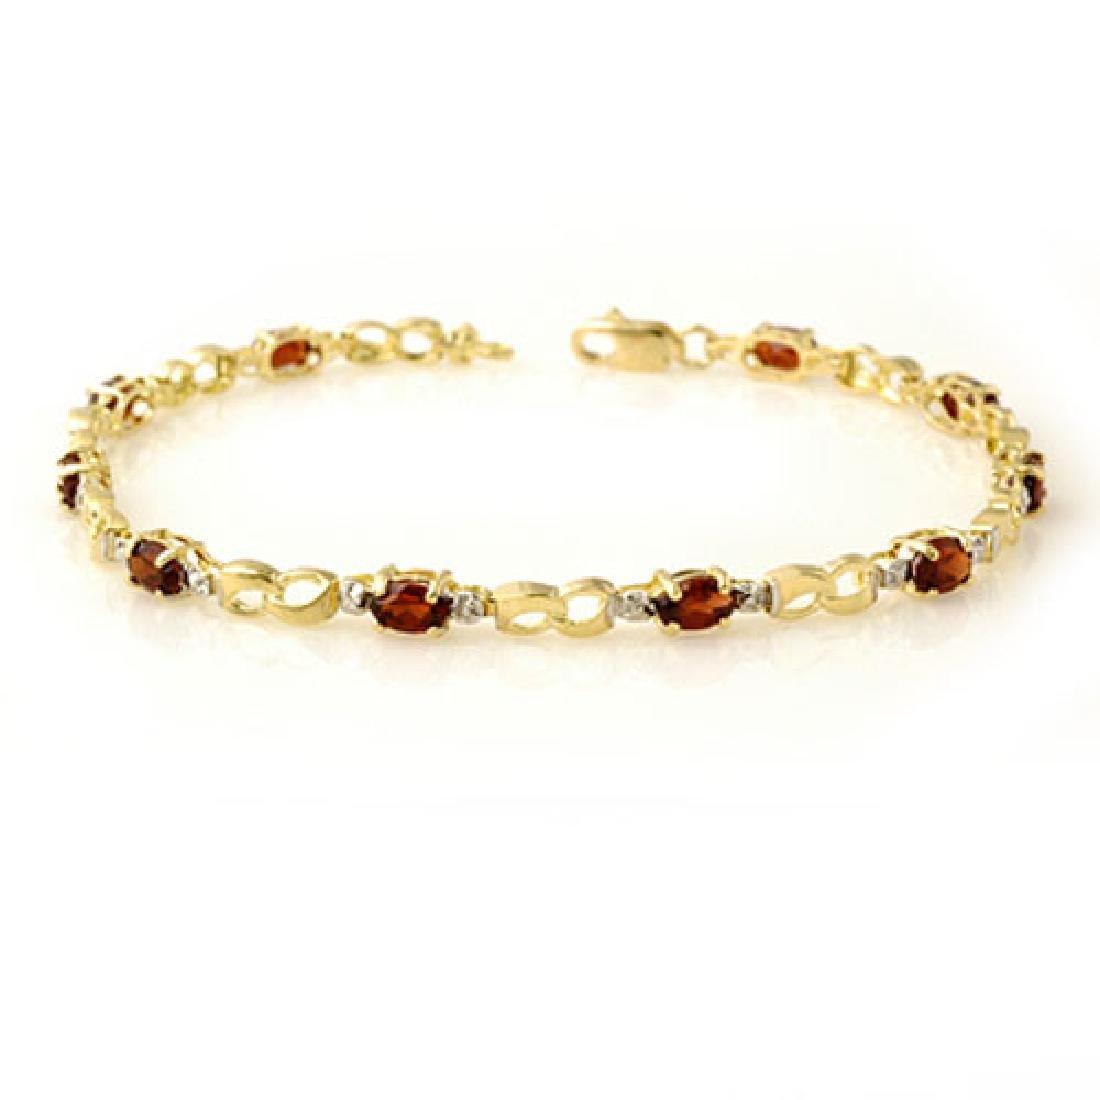 2.76 CTW Garnet & Diamond Bracelet 10K Yellow Gold